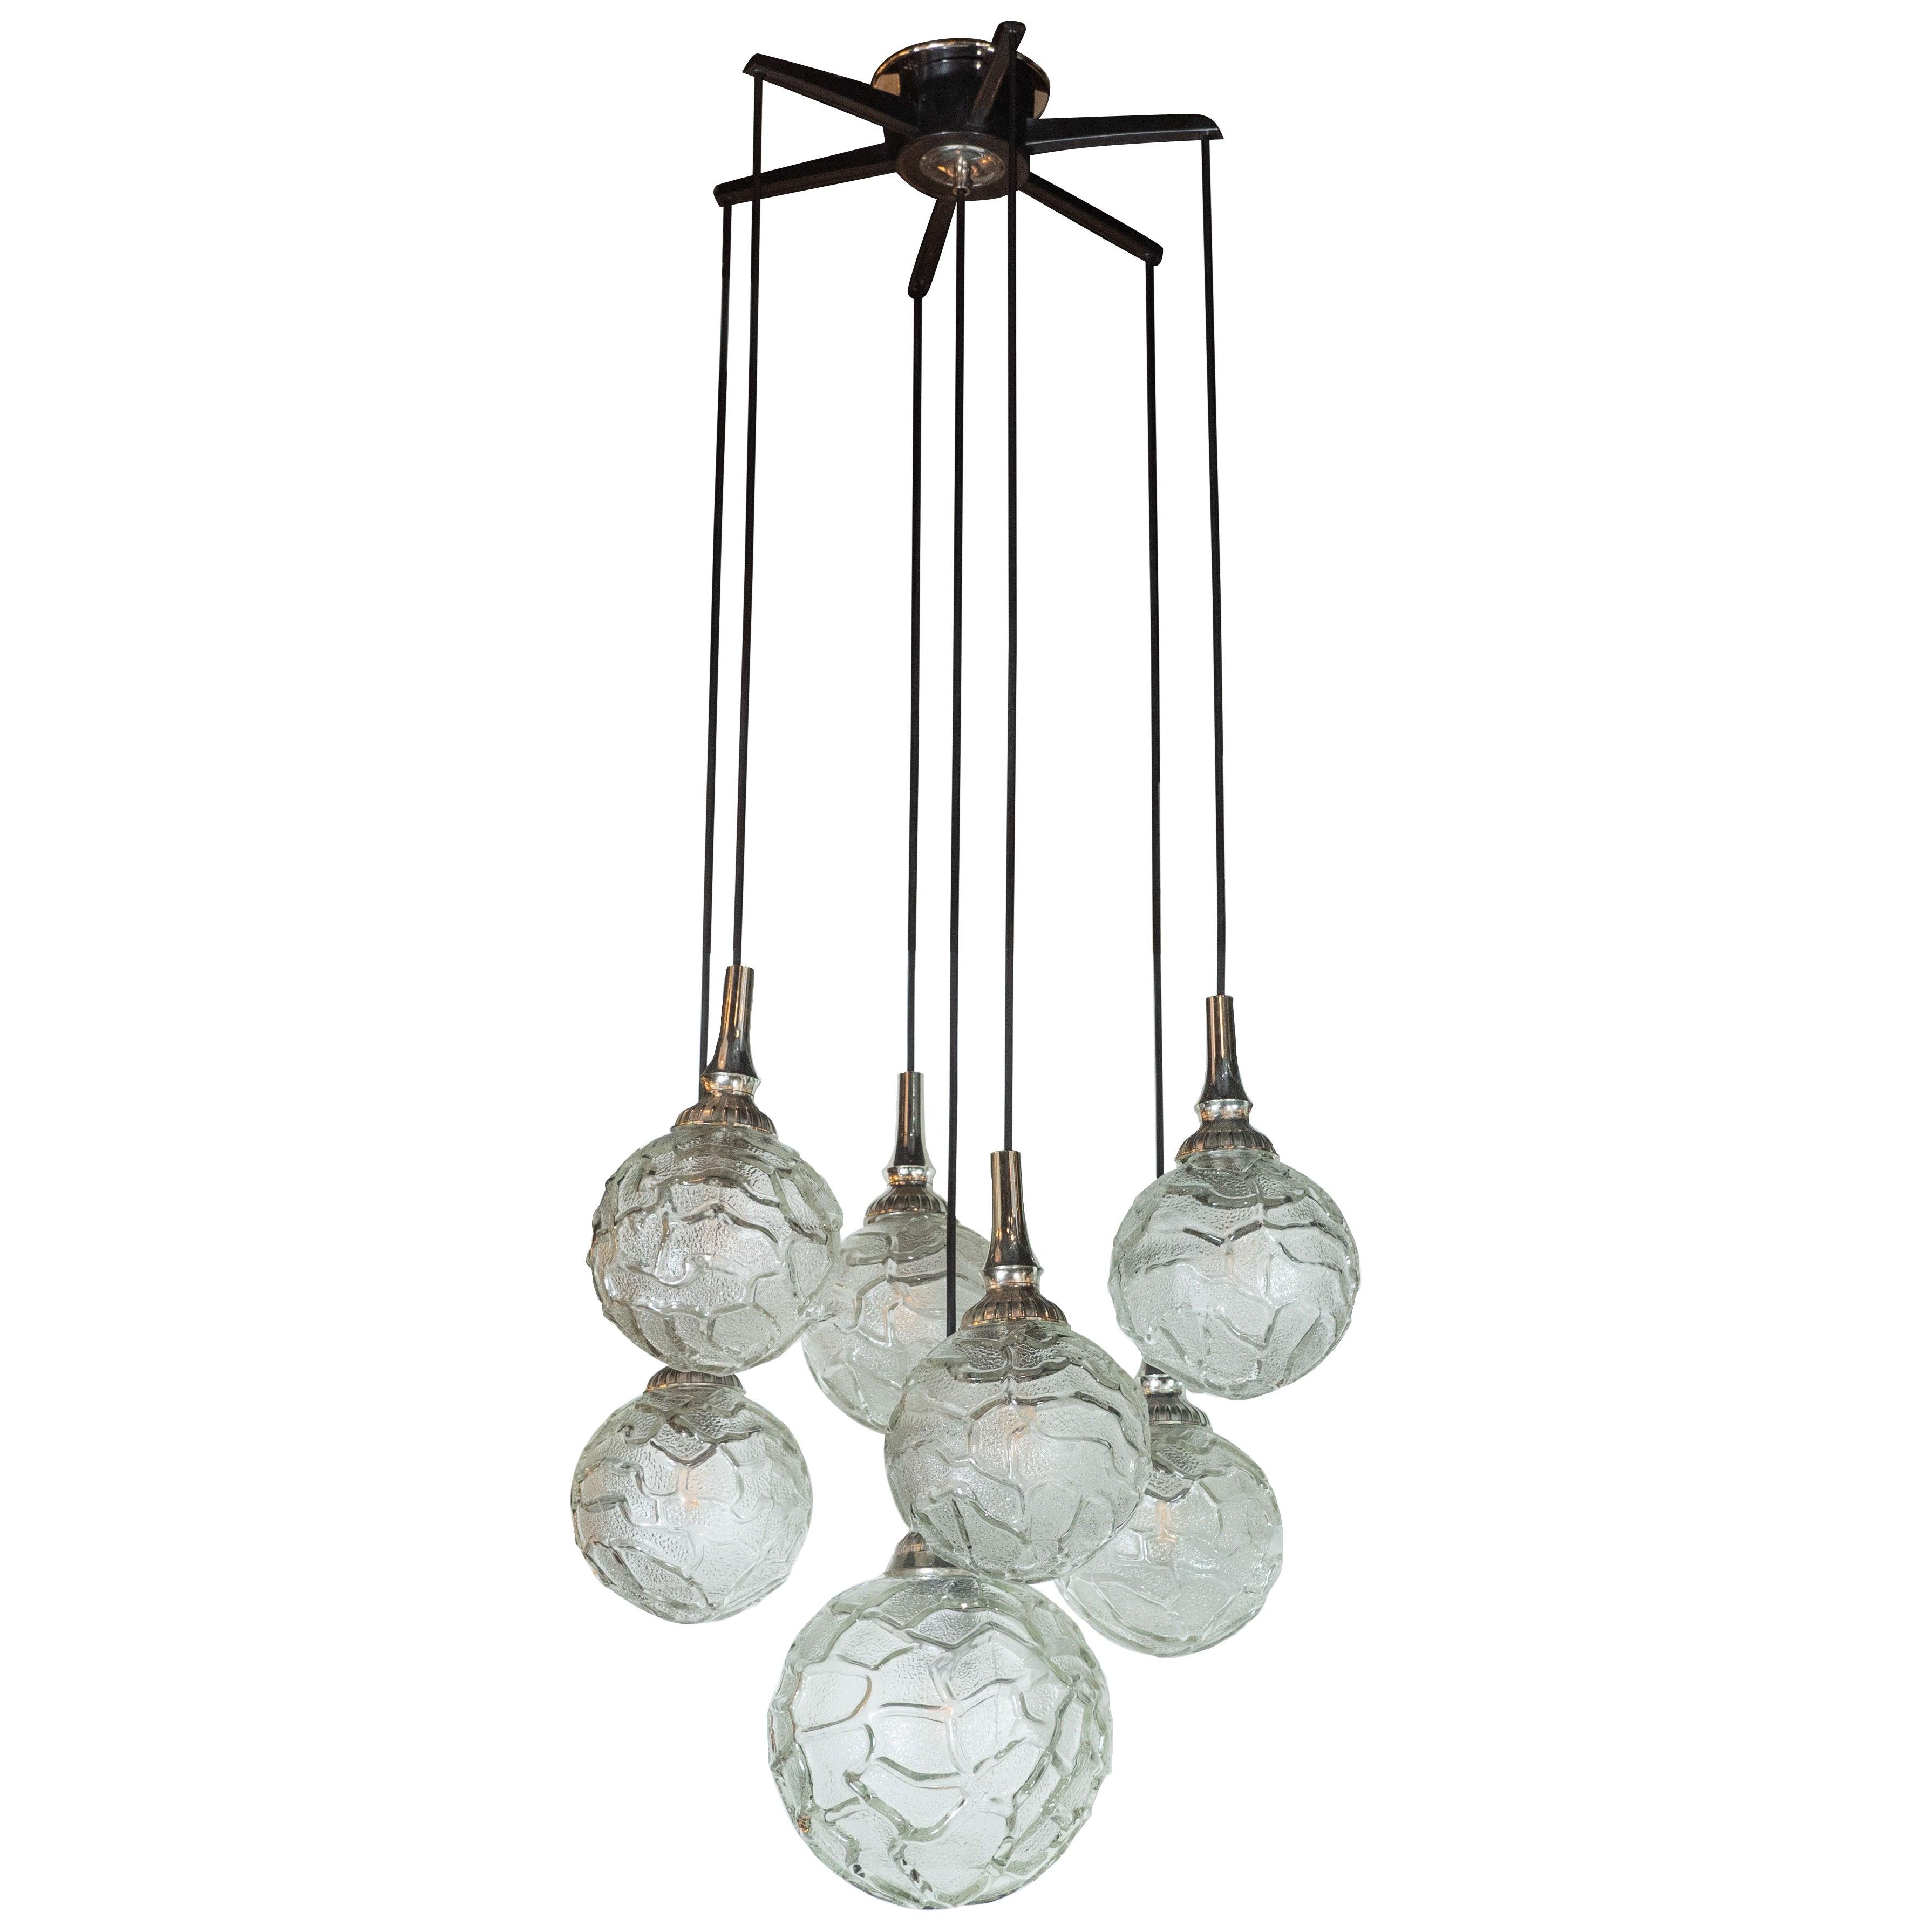 Mid century modern six spherical orb chandelier w organic textured glass